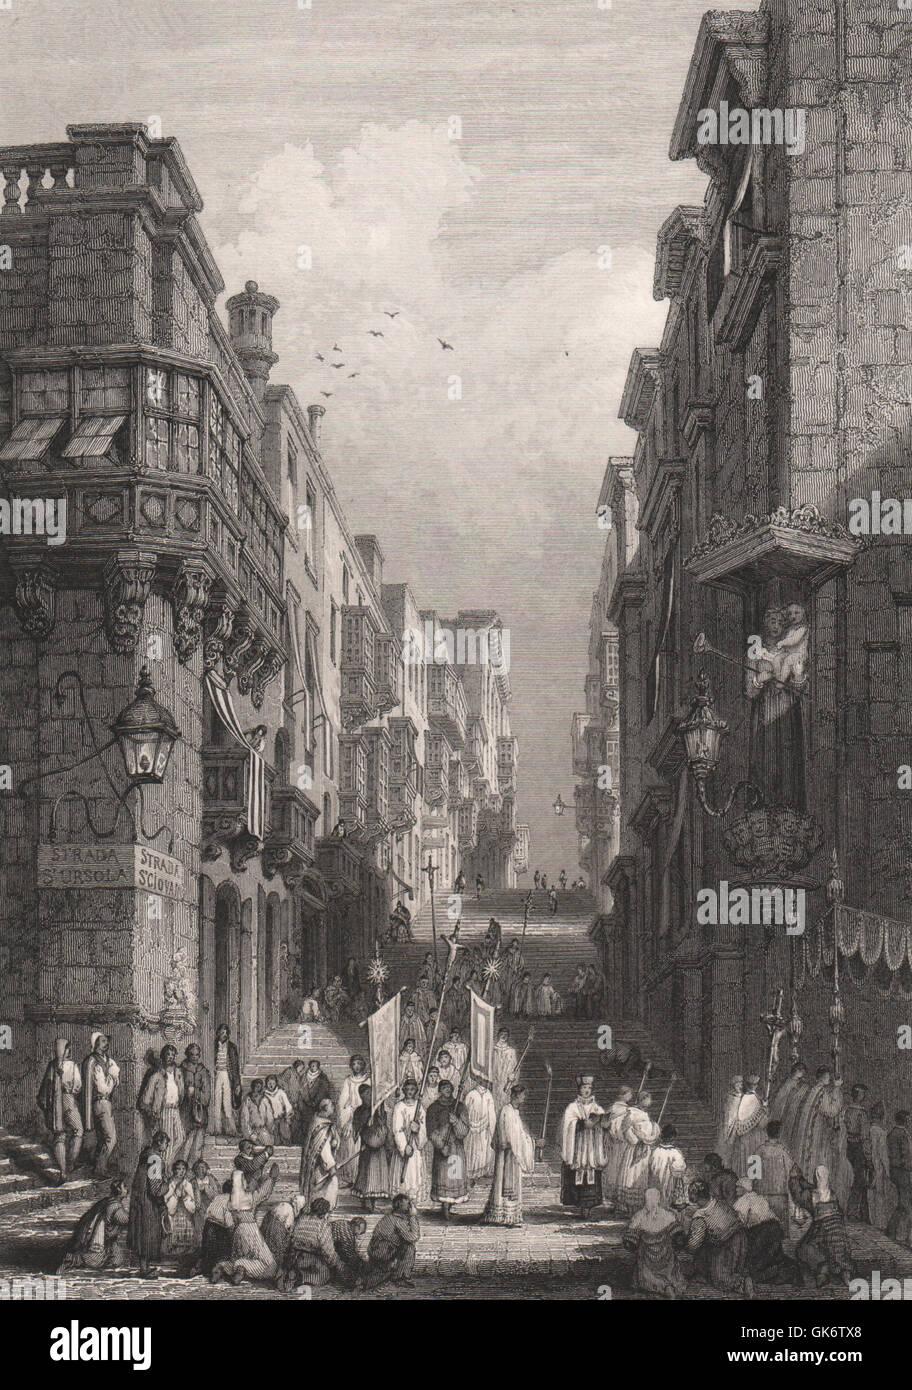 Strada St. Giovanni, Valletta, Malta, antique print 1840 - Stock Image